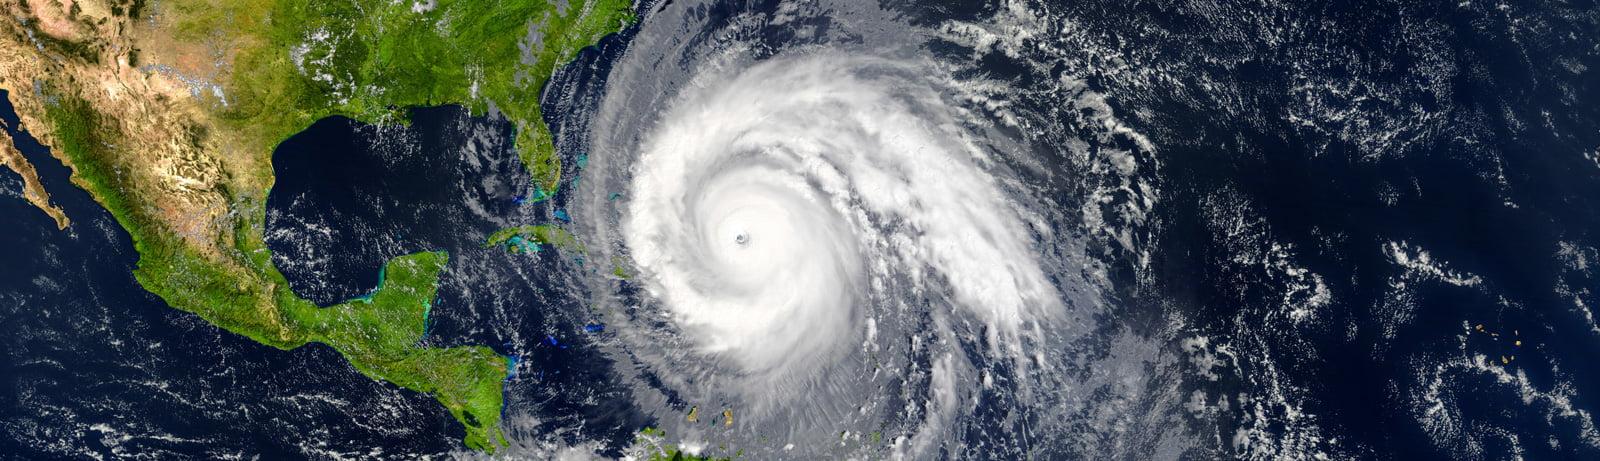 Triton Hurricane